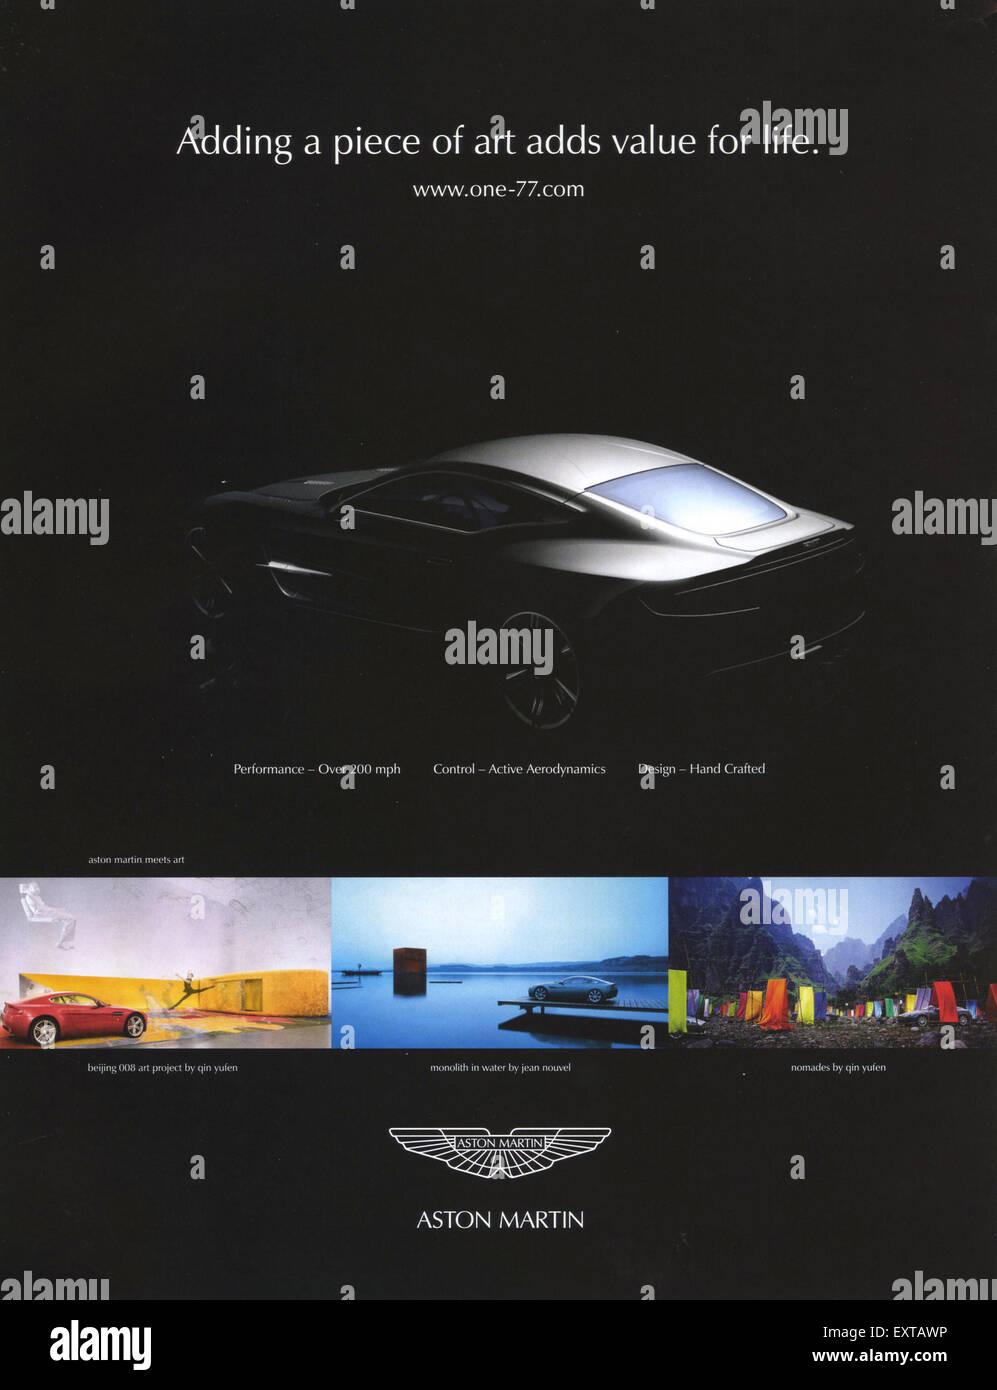 2000s uk aston martin magazine advert stock photo: 85357938 - alamy